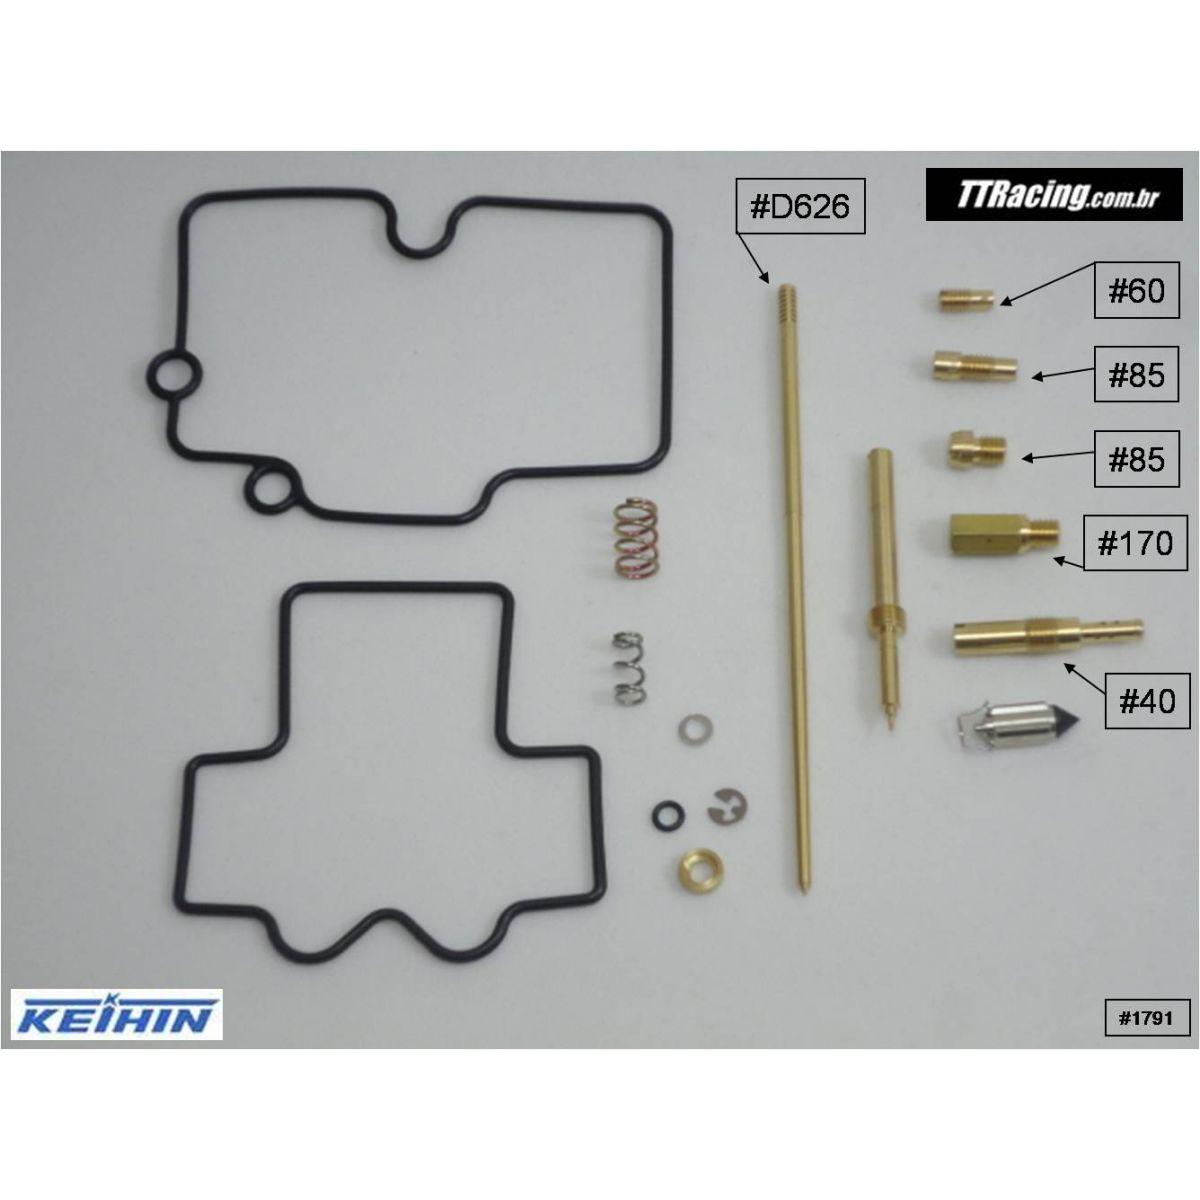 Reparo carburador Keihin CR FLAT FCR-MX PREPARADOR  - T & T Soluções